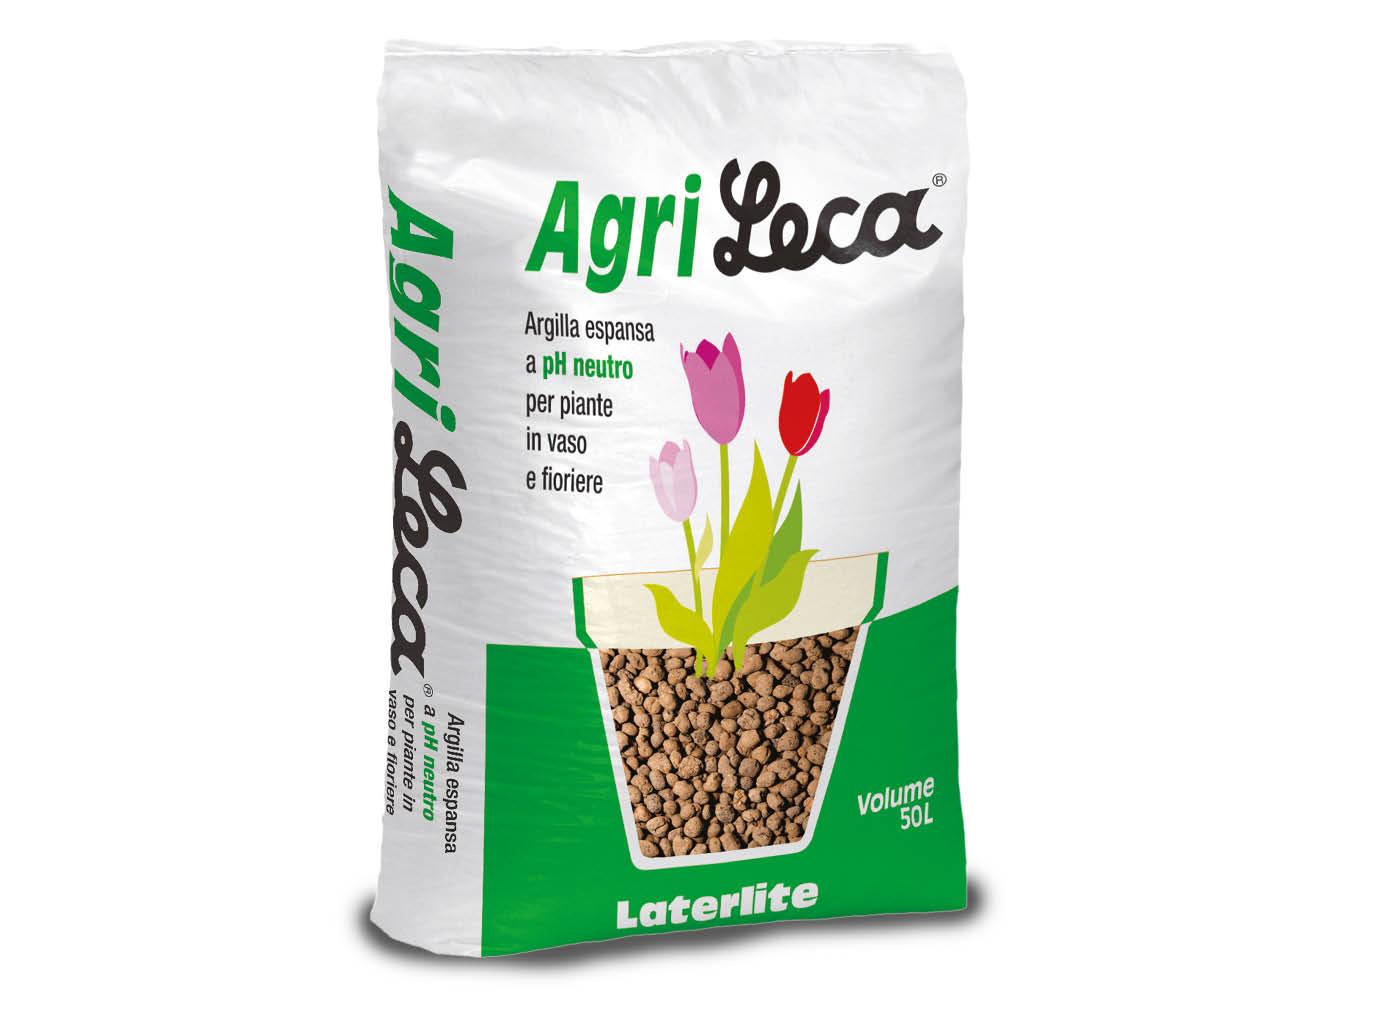 sacco-agrileca-argilla-espansa-per-piante-P43-1